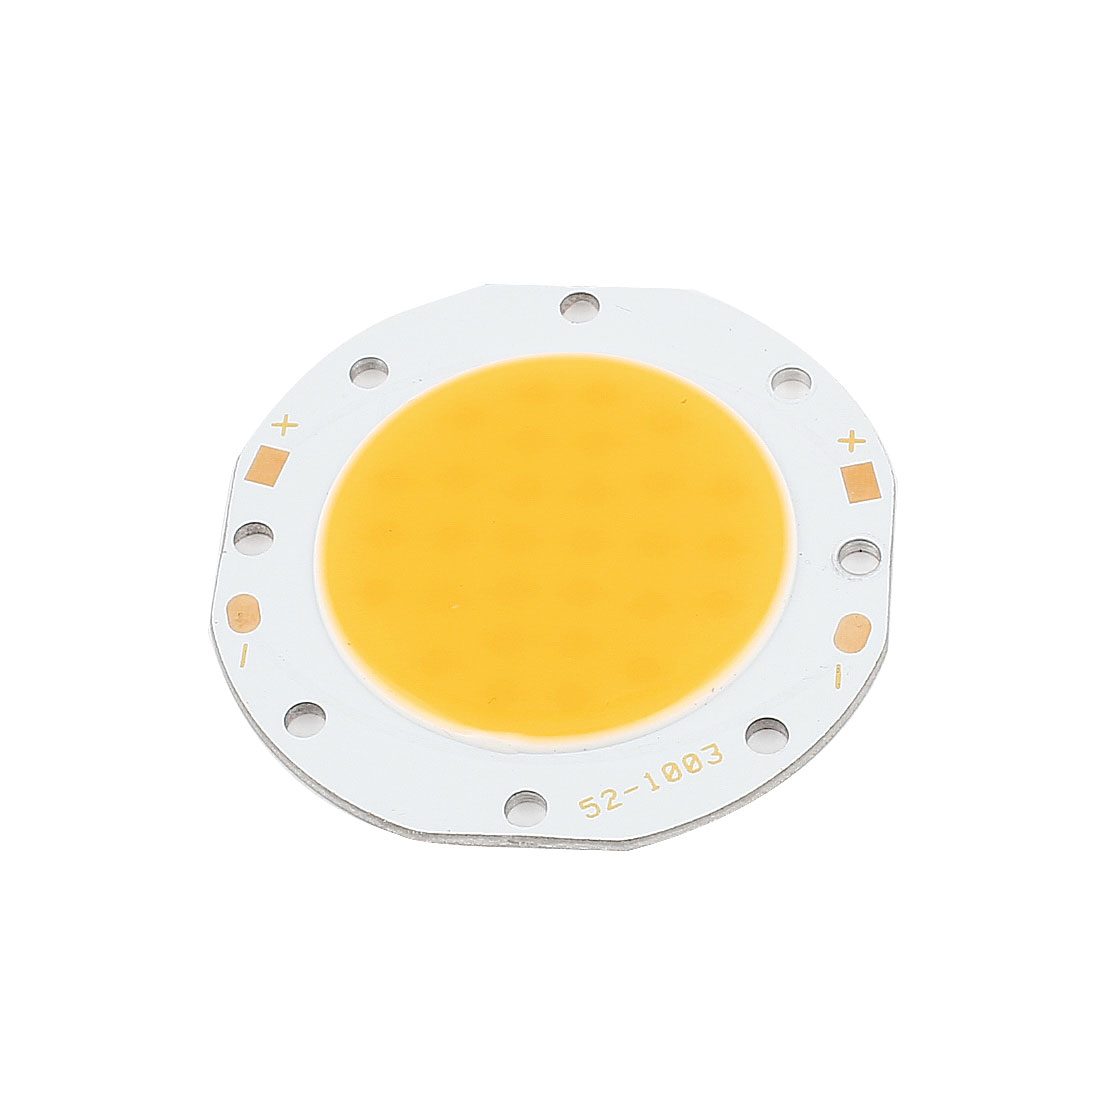 30W DC30-36V 900mA 80-100LM/W Warm White LED Light COB Lamp Bead Chip